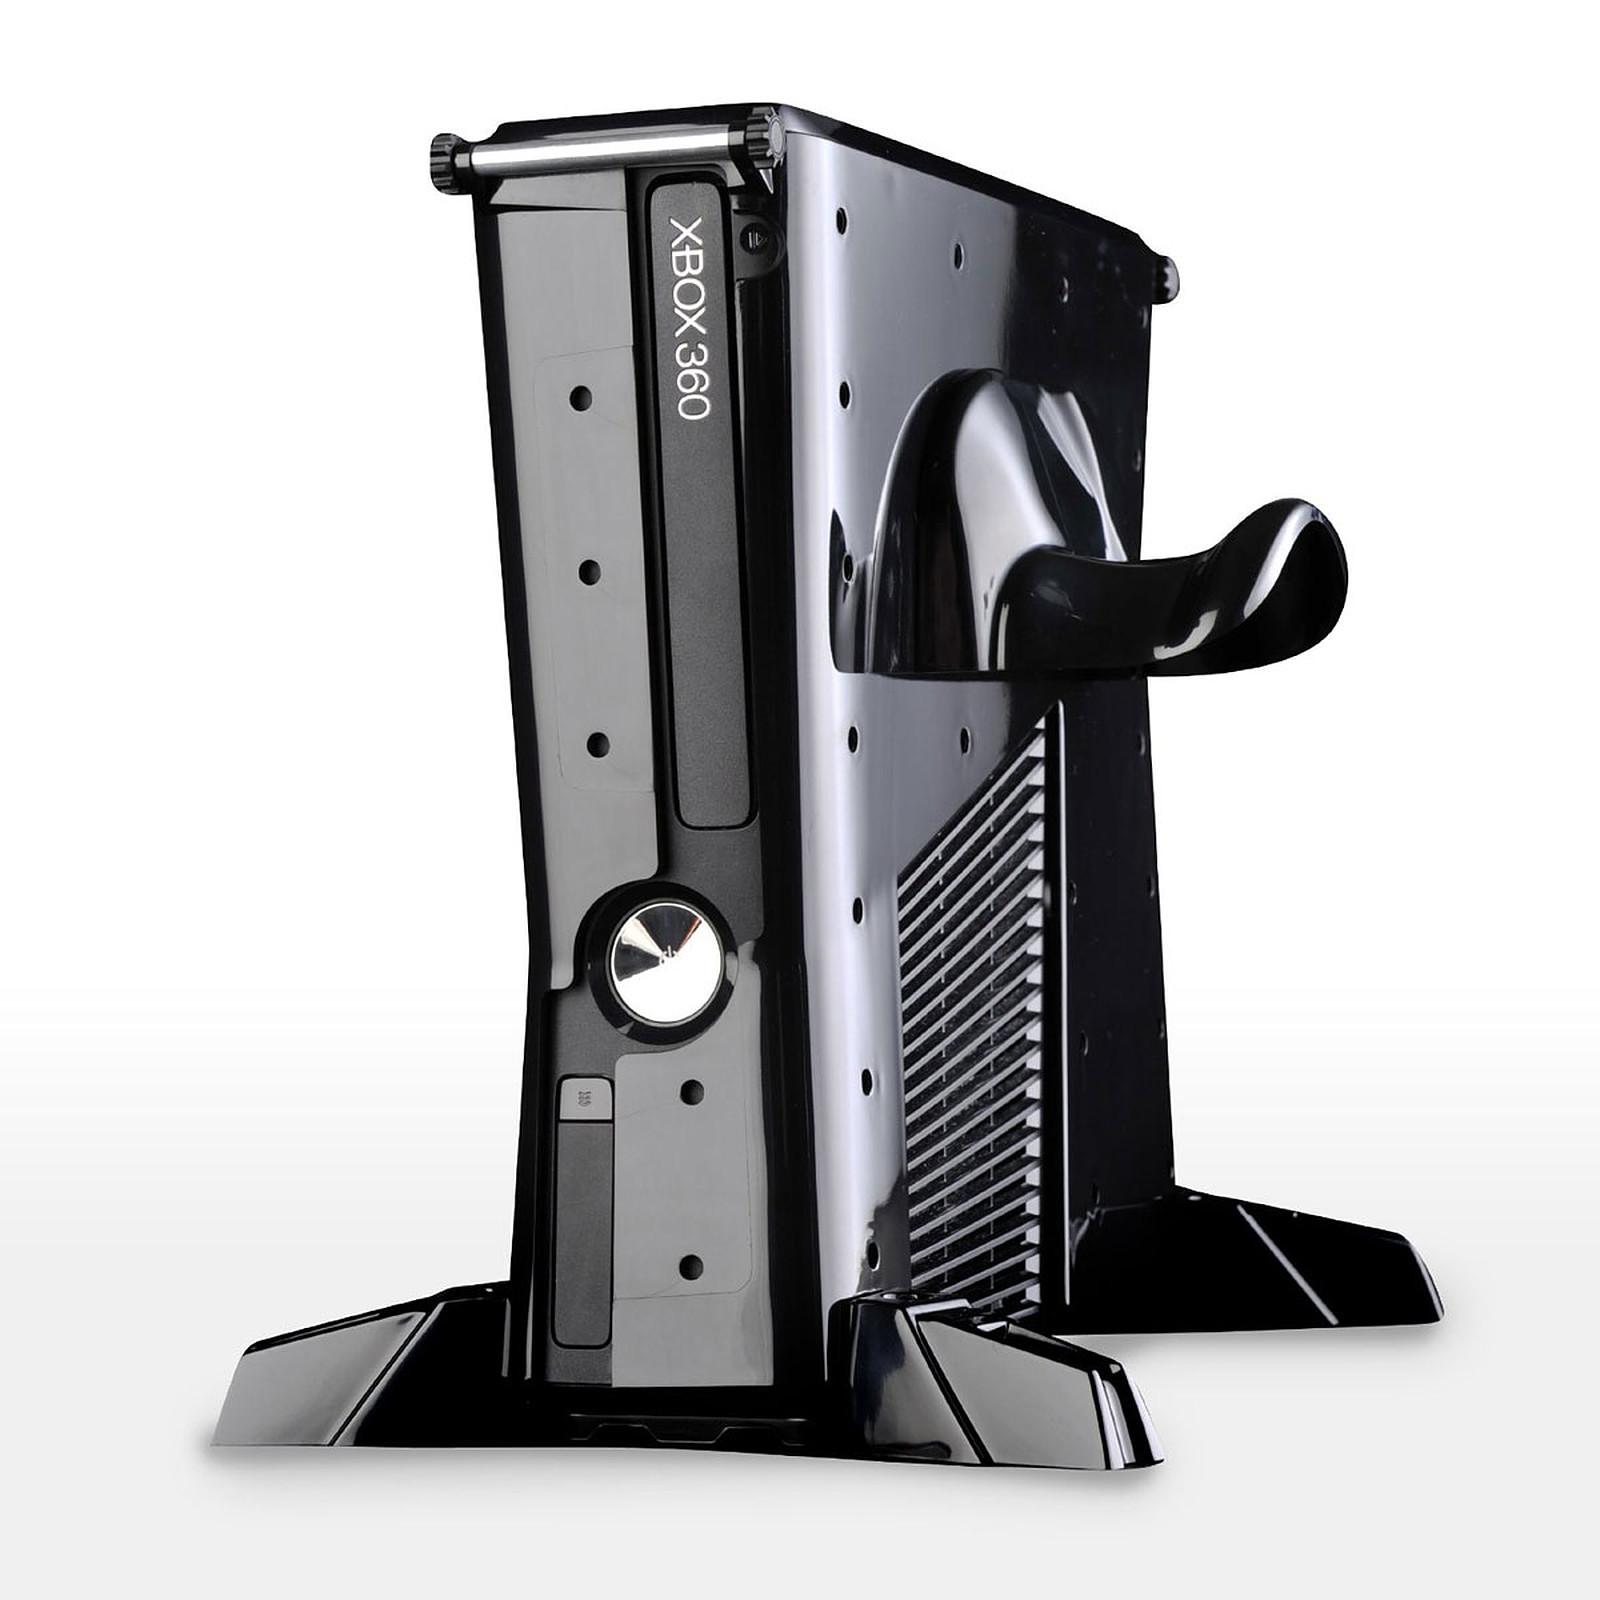 Calibur 11 Coque Vault Noire (Xbox 360)